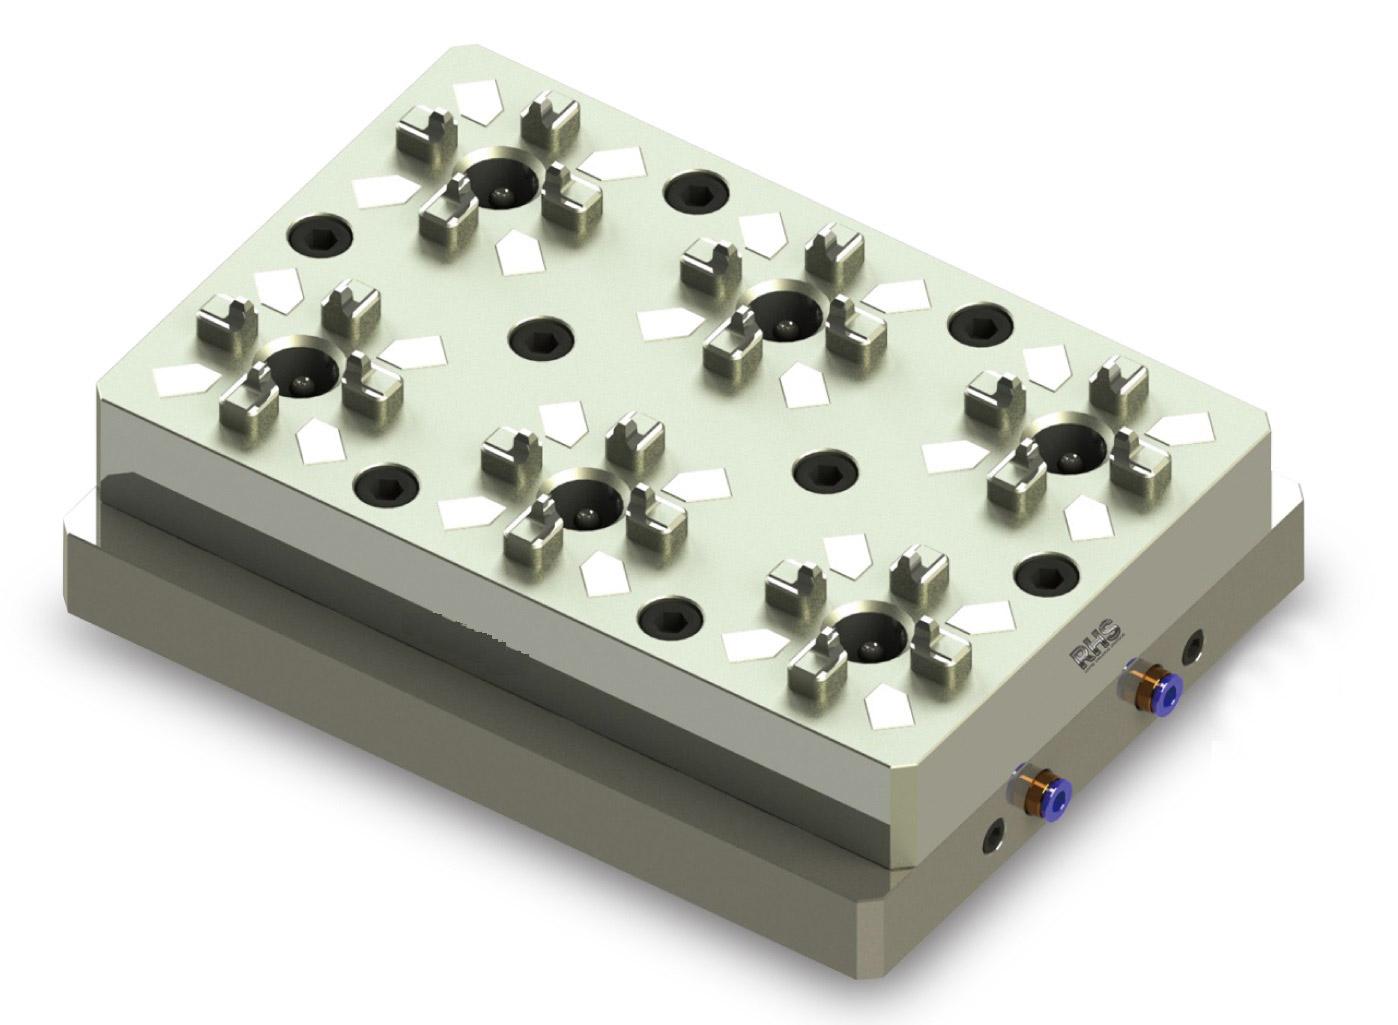 Erowa Compatible ER-011803 Pneumatic 6 In 1 Mini Chuck System